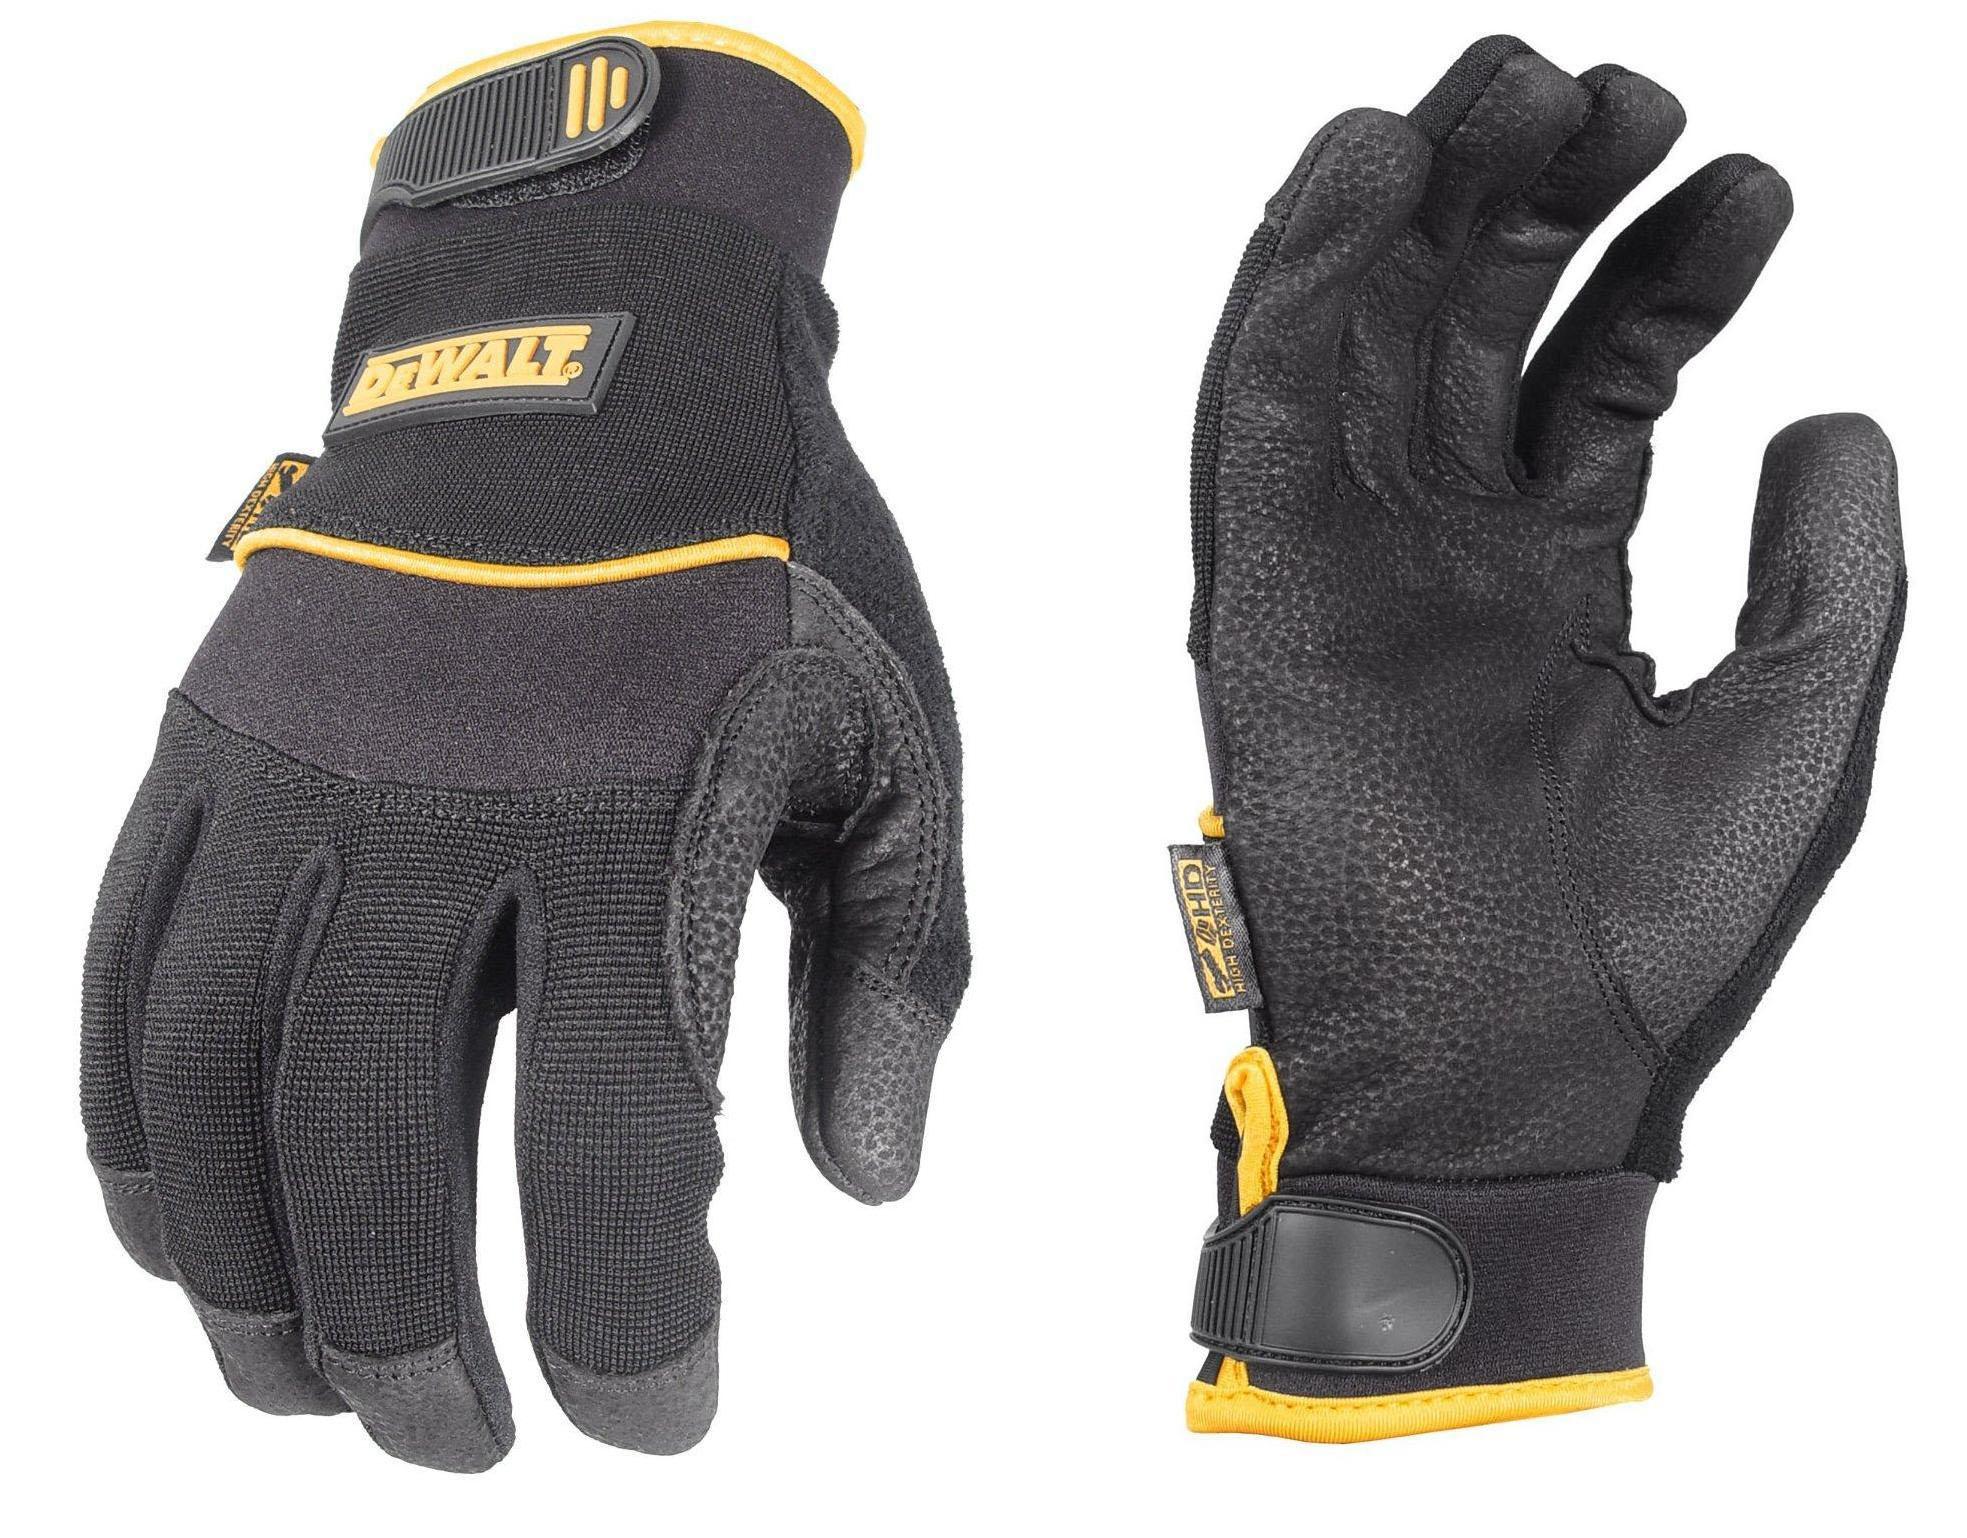 - Premium Leather Performance Palm Glove